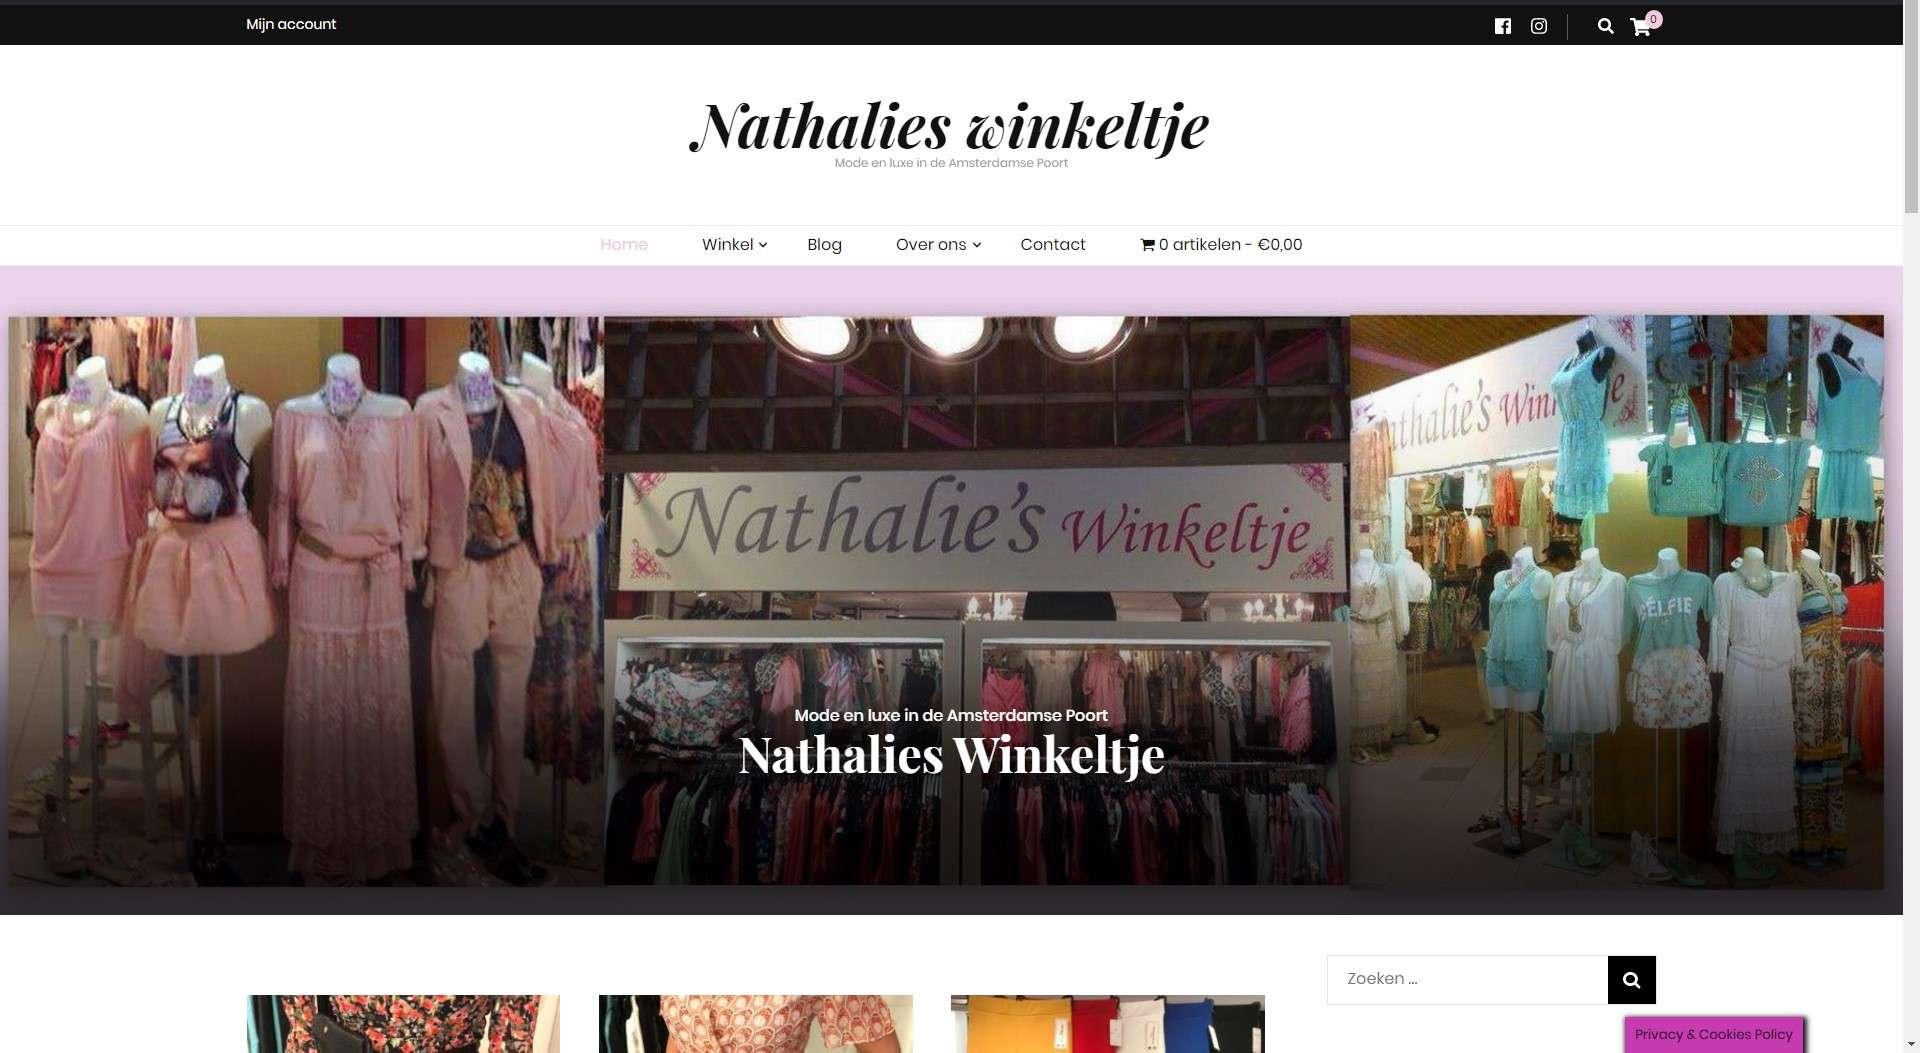 Nathalieswinkeltje de leukste modewinkel in de Amsterdamse shopperhal. Referenties onlinewebshop.eu